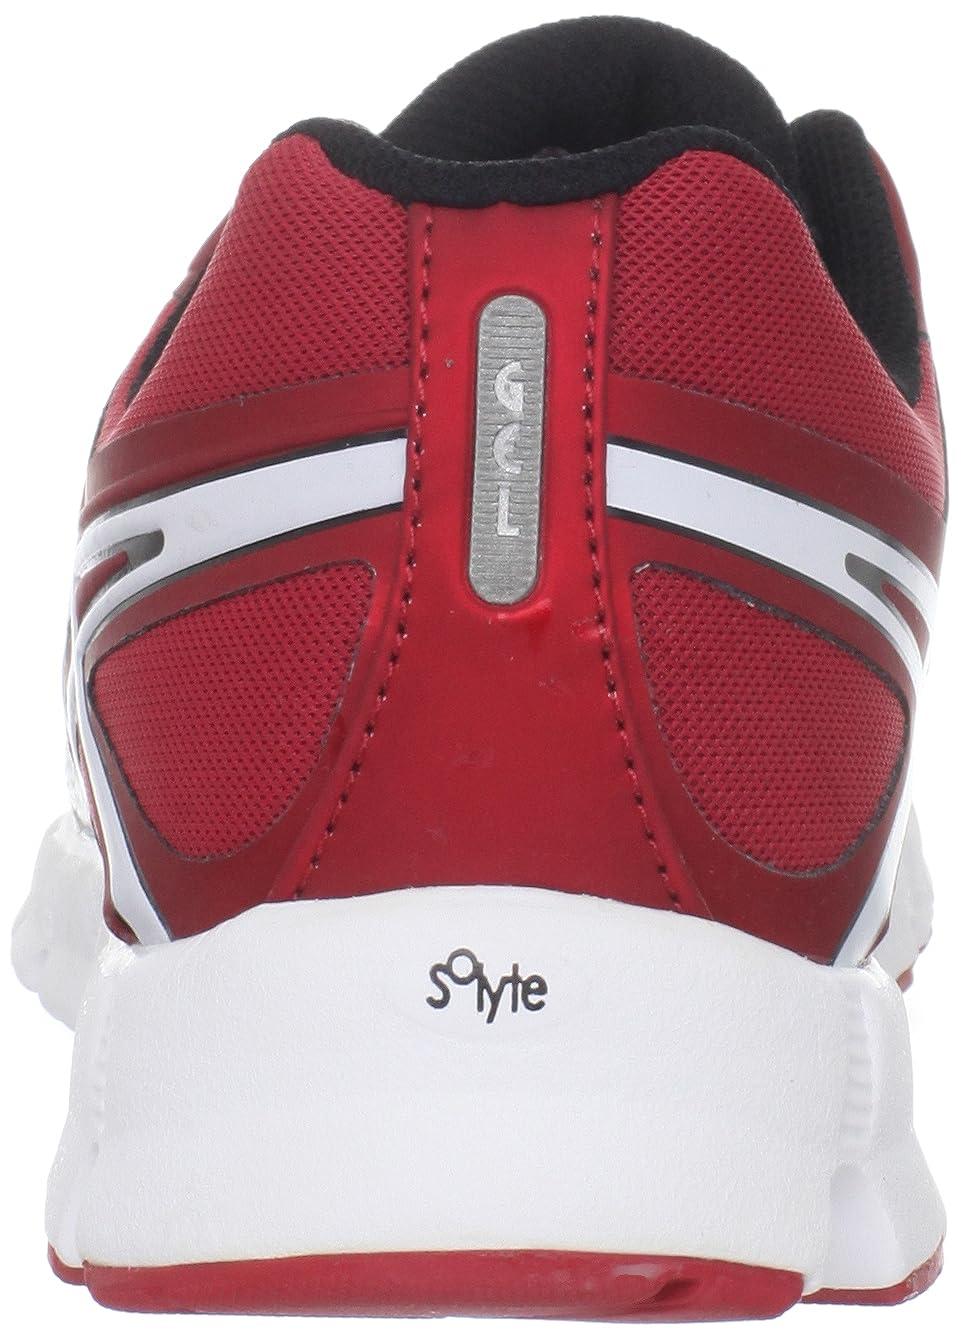 ASICS schuhe,Onyx Men's GEL-Lyte33 Running schuhe,Onyx ASICS Weiß Flame,12 M US 27f3e1